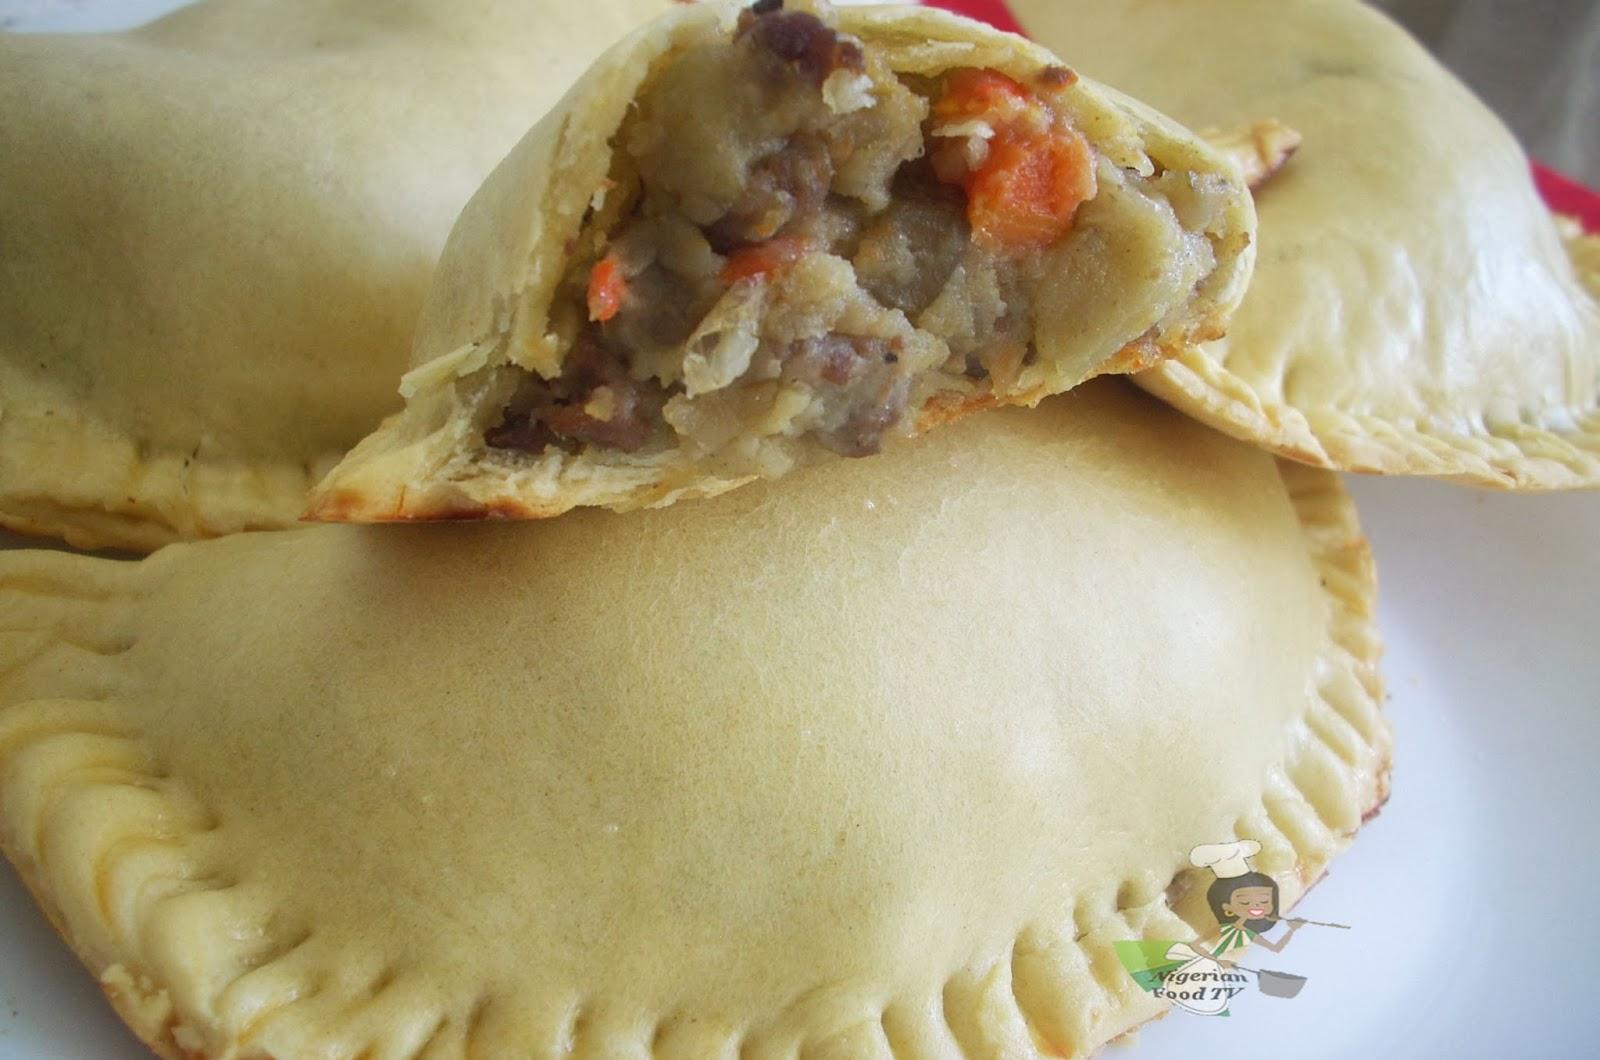 Nigerian Meat Pie recipe : How to make Nigerian Meatpie - Nigerian